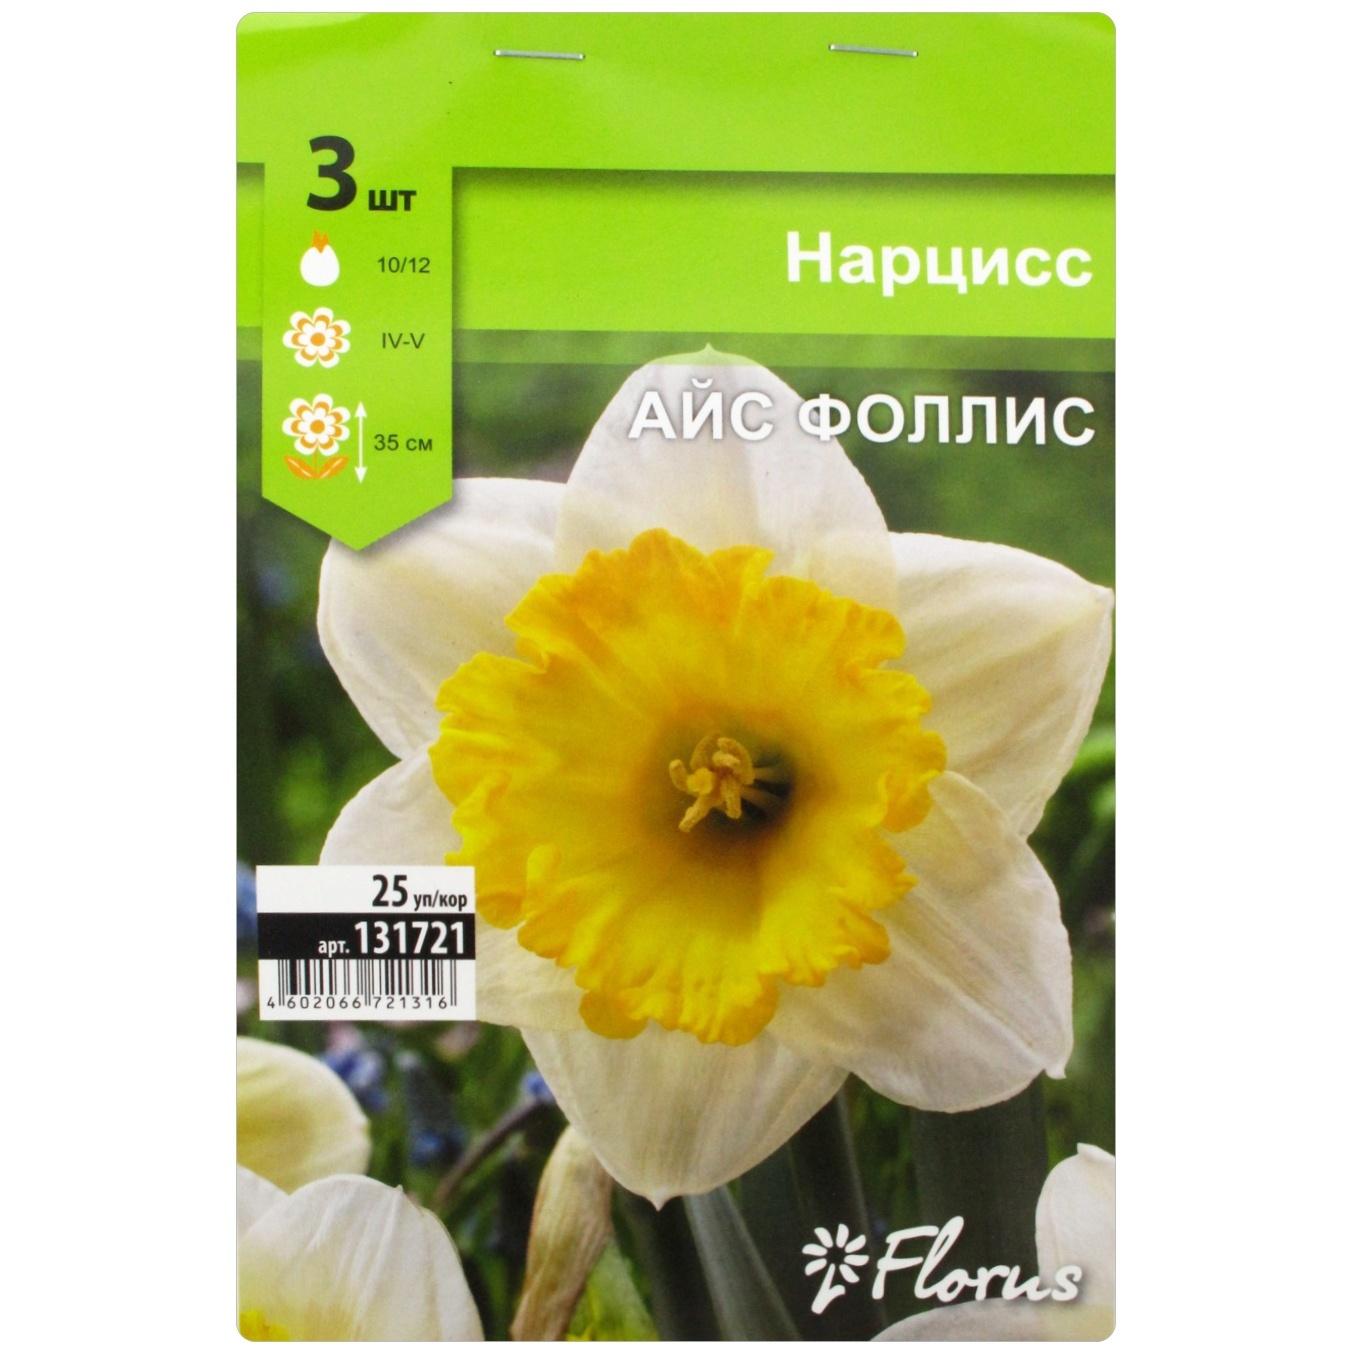 Описание и характеристики нарцисса сорта реплит, выращивание и уход